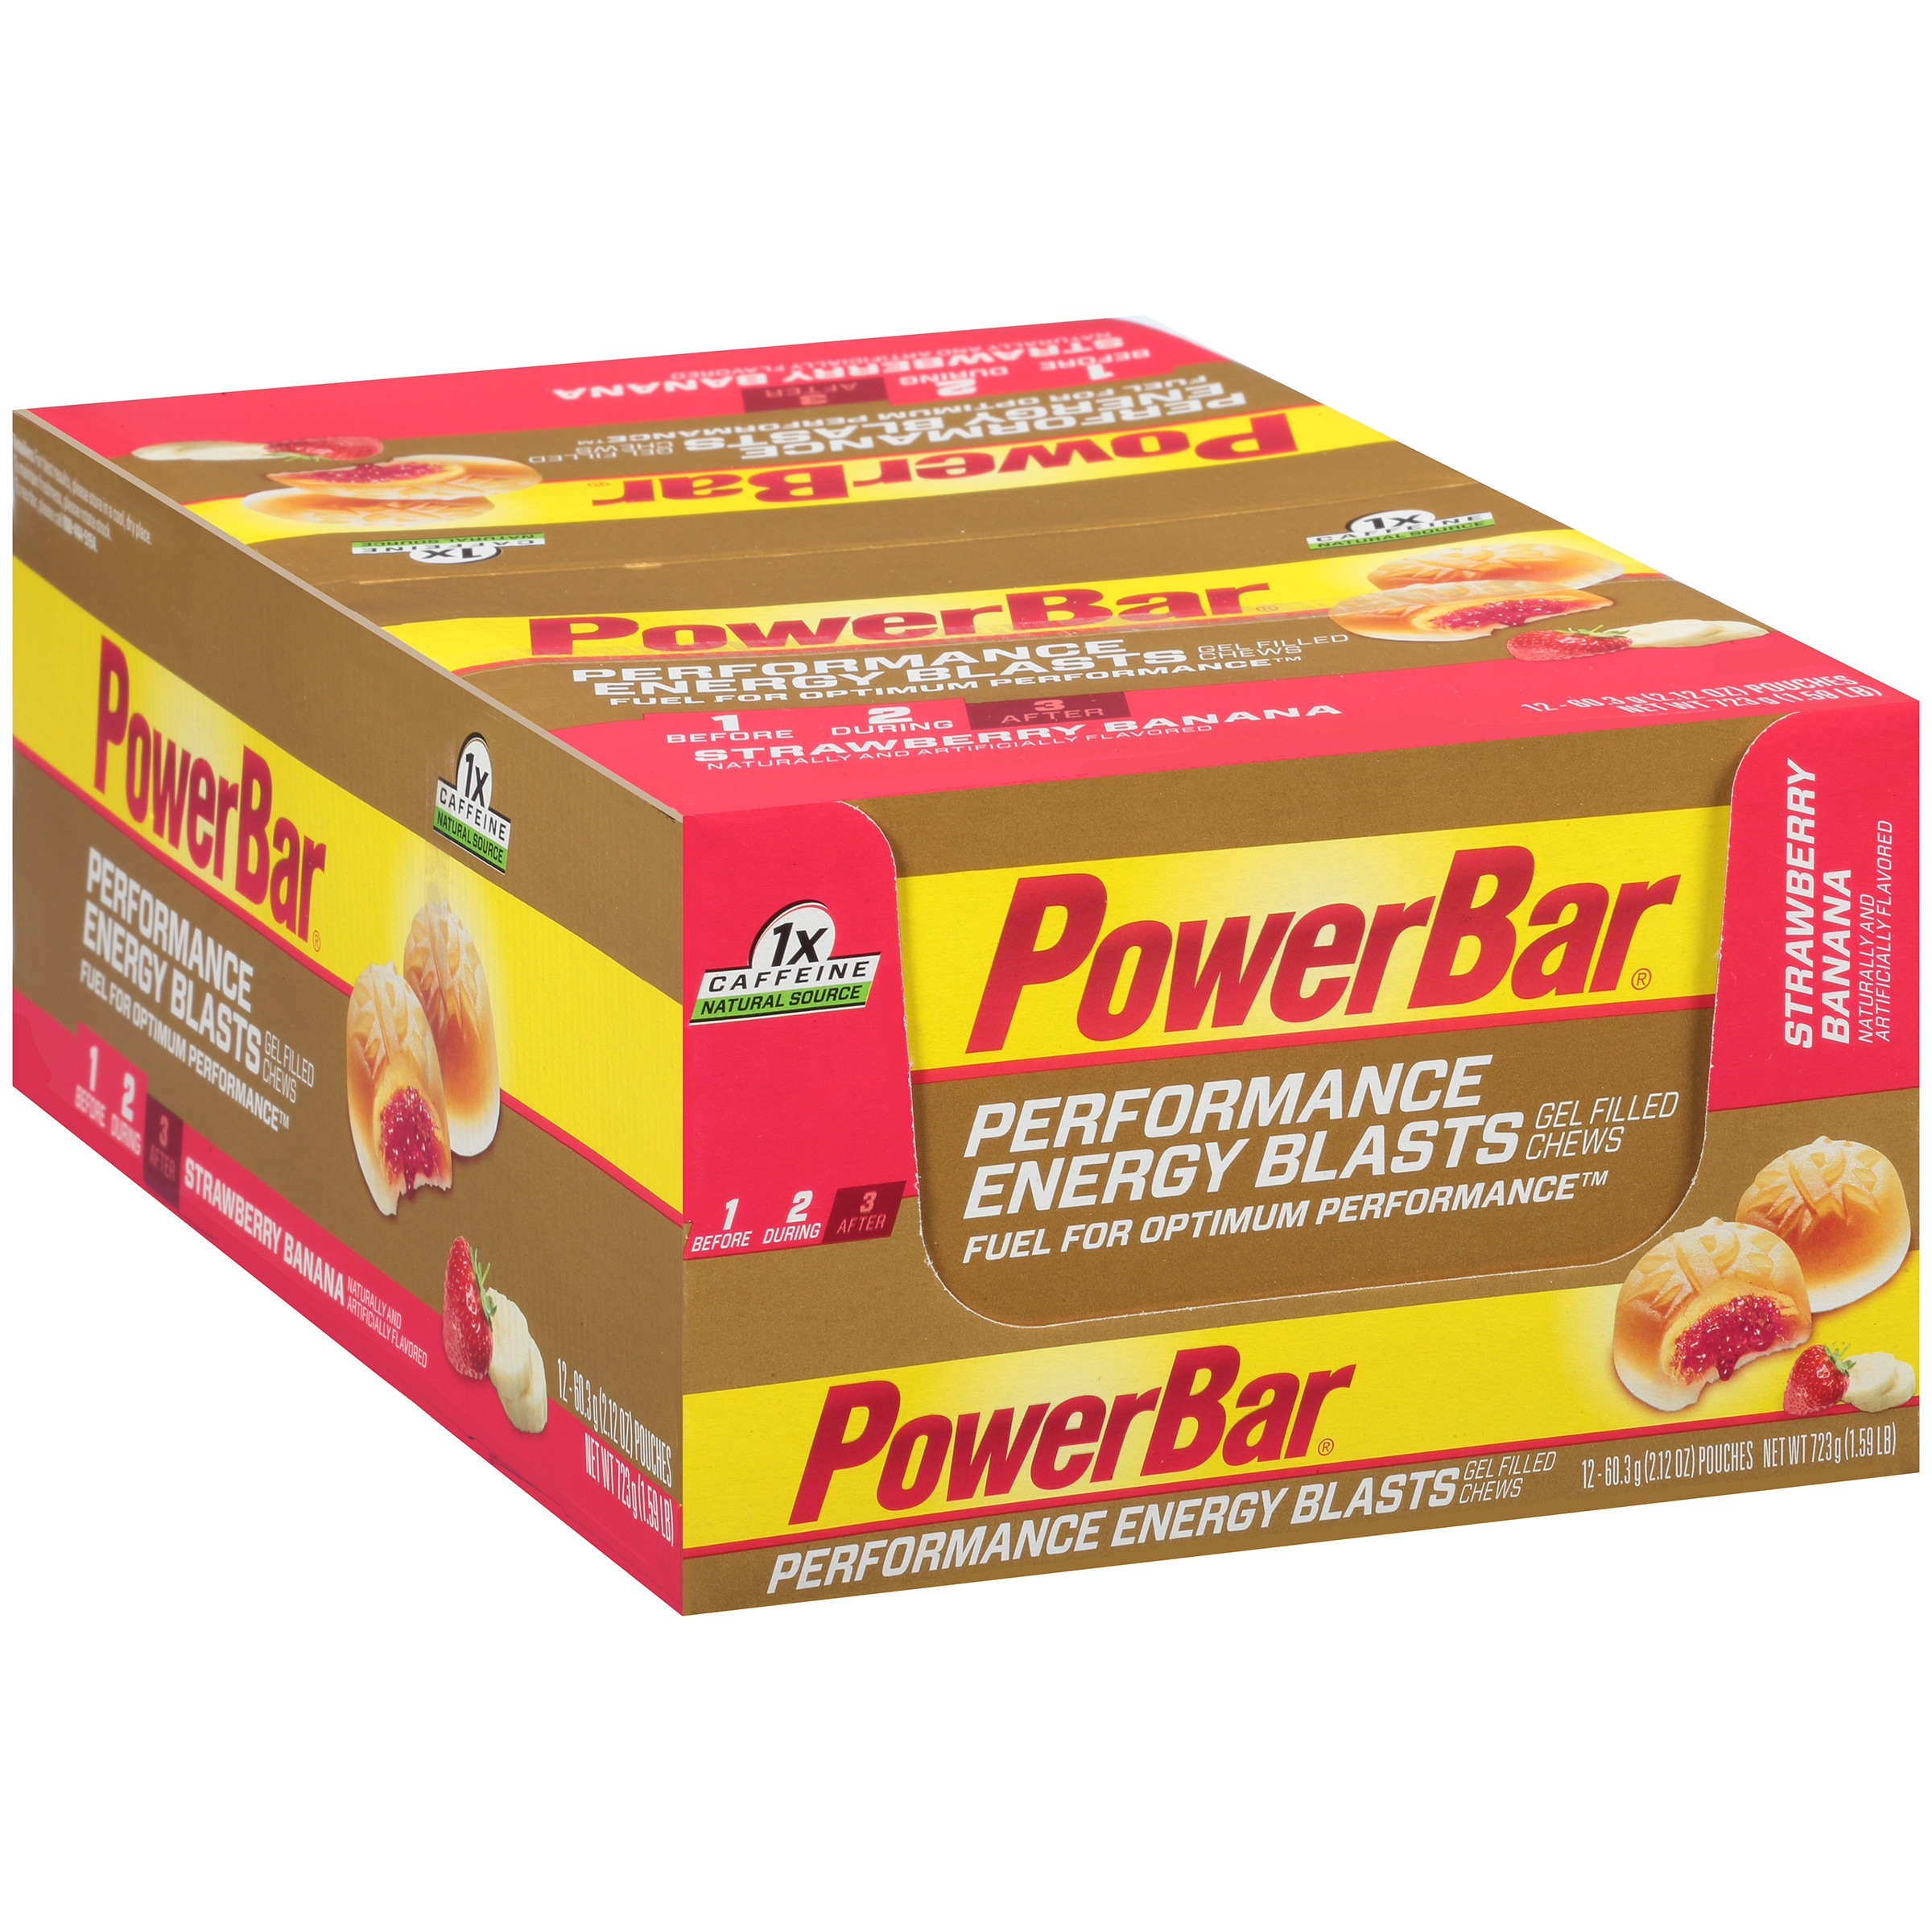 PowerBar® Strawberry Banana Performance Energy Blasts Gel Filled Chews 12- 2.12 oz. Pouches